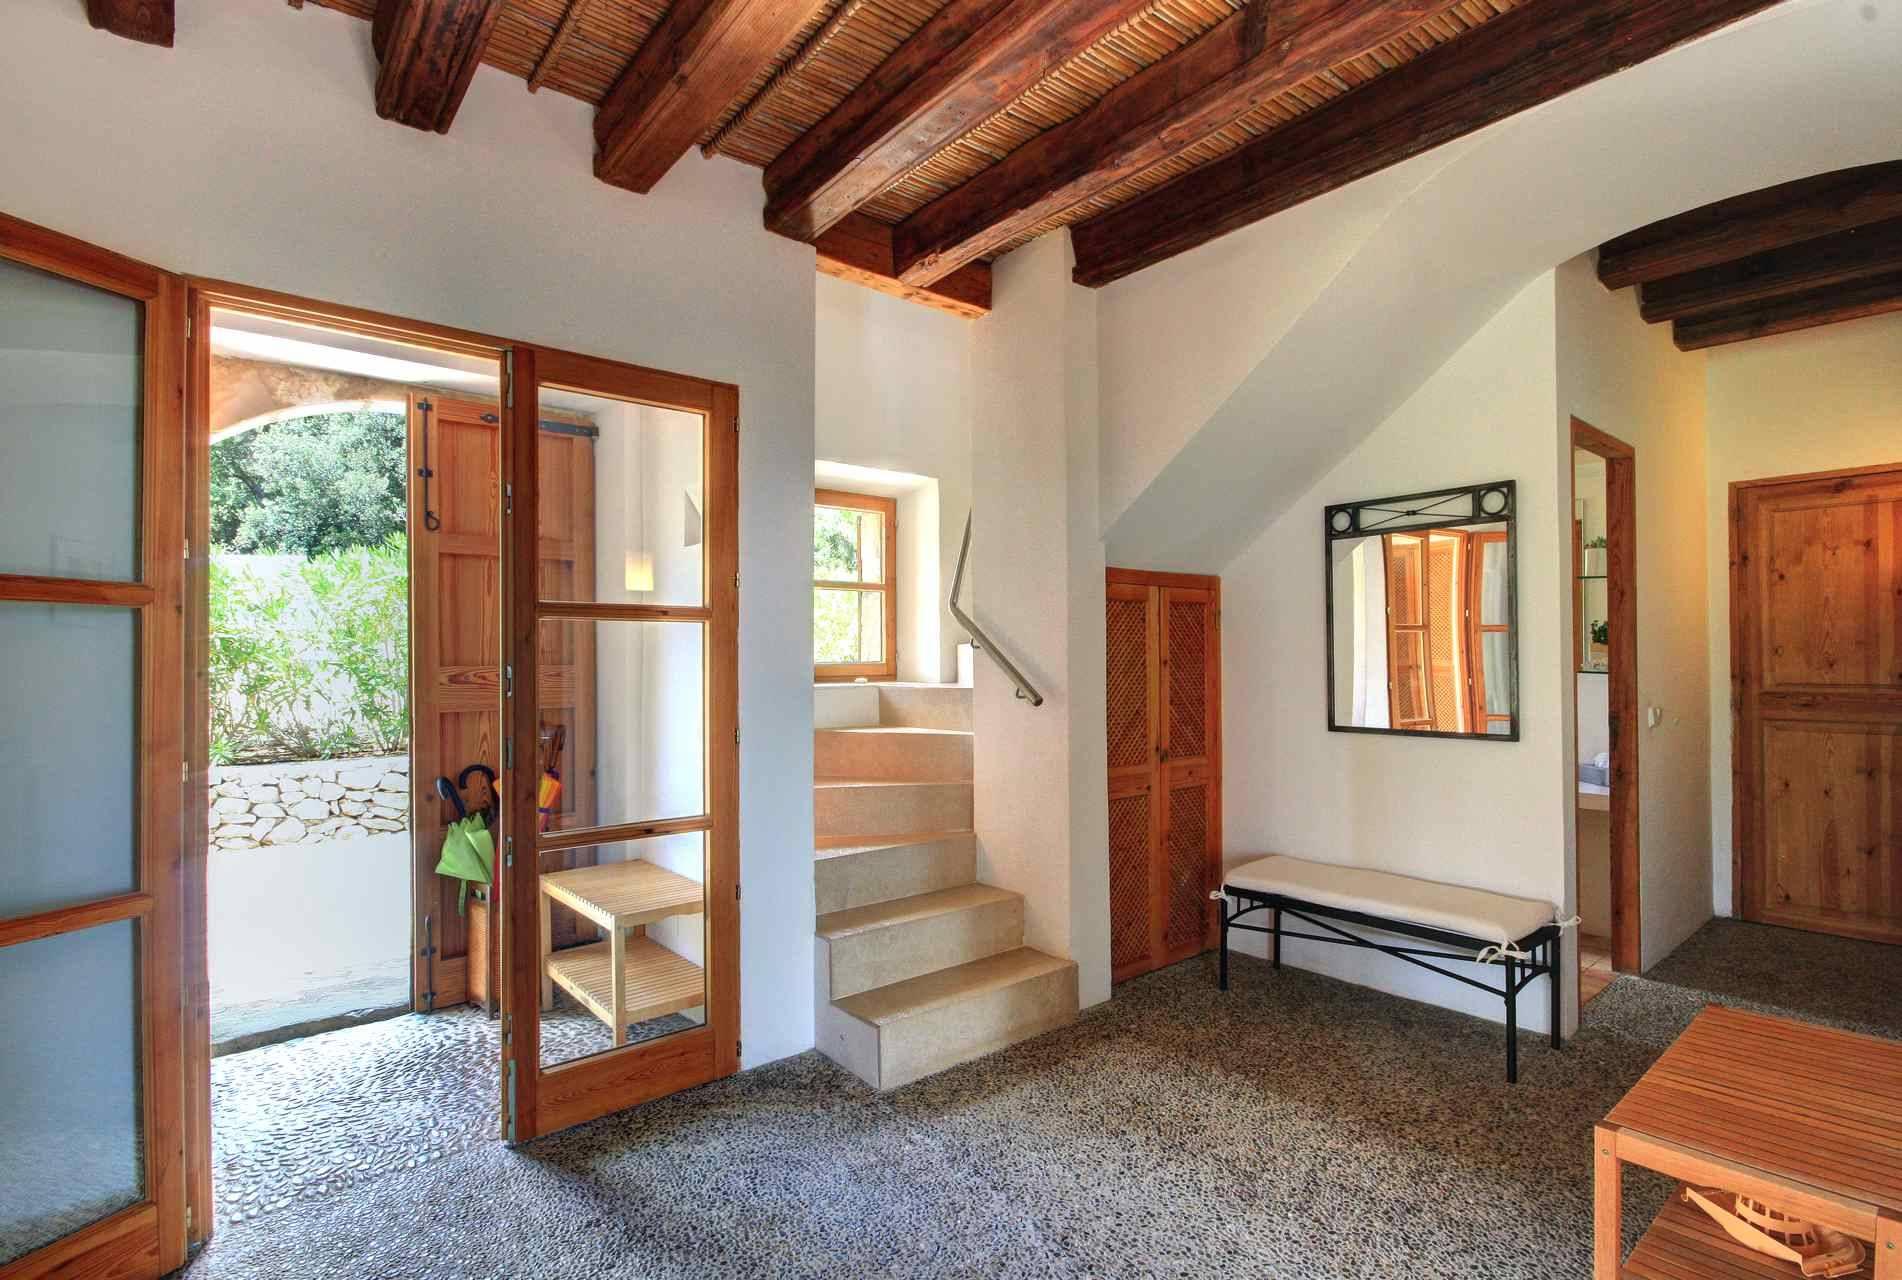 01-51 Authentic Finca Mallorca Northeast Bild 14